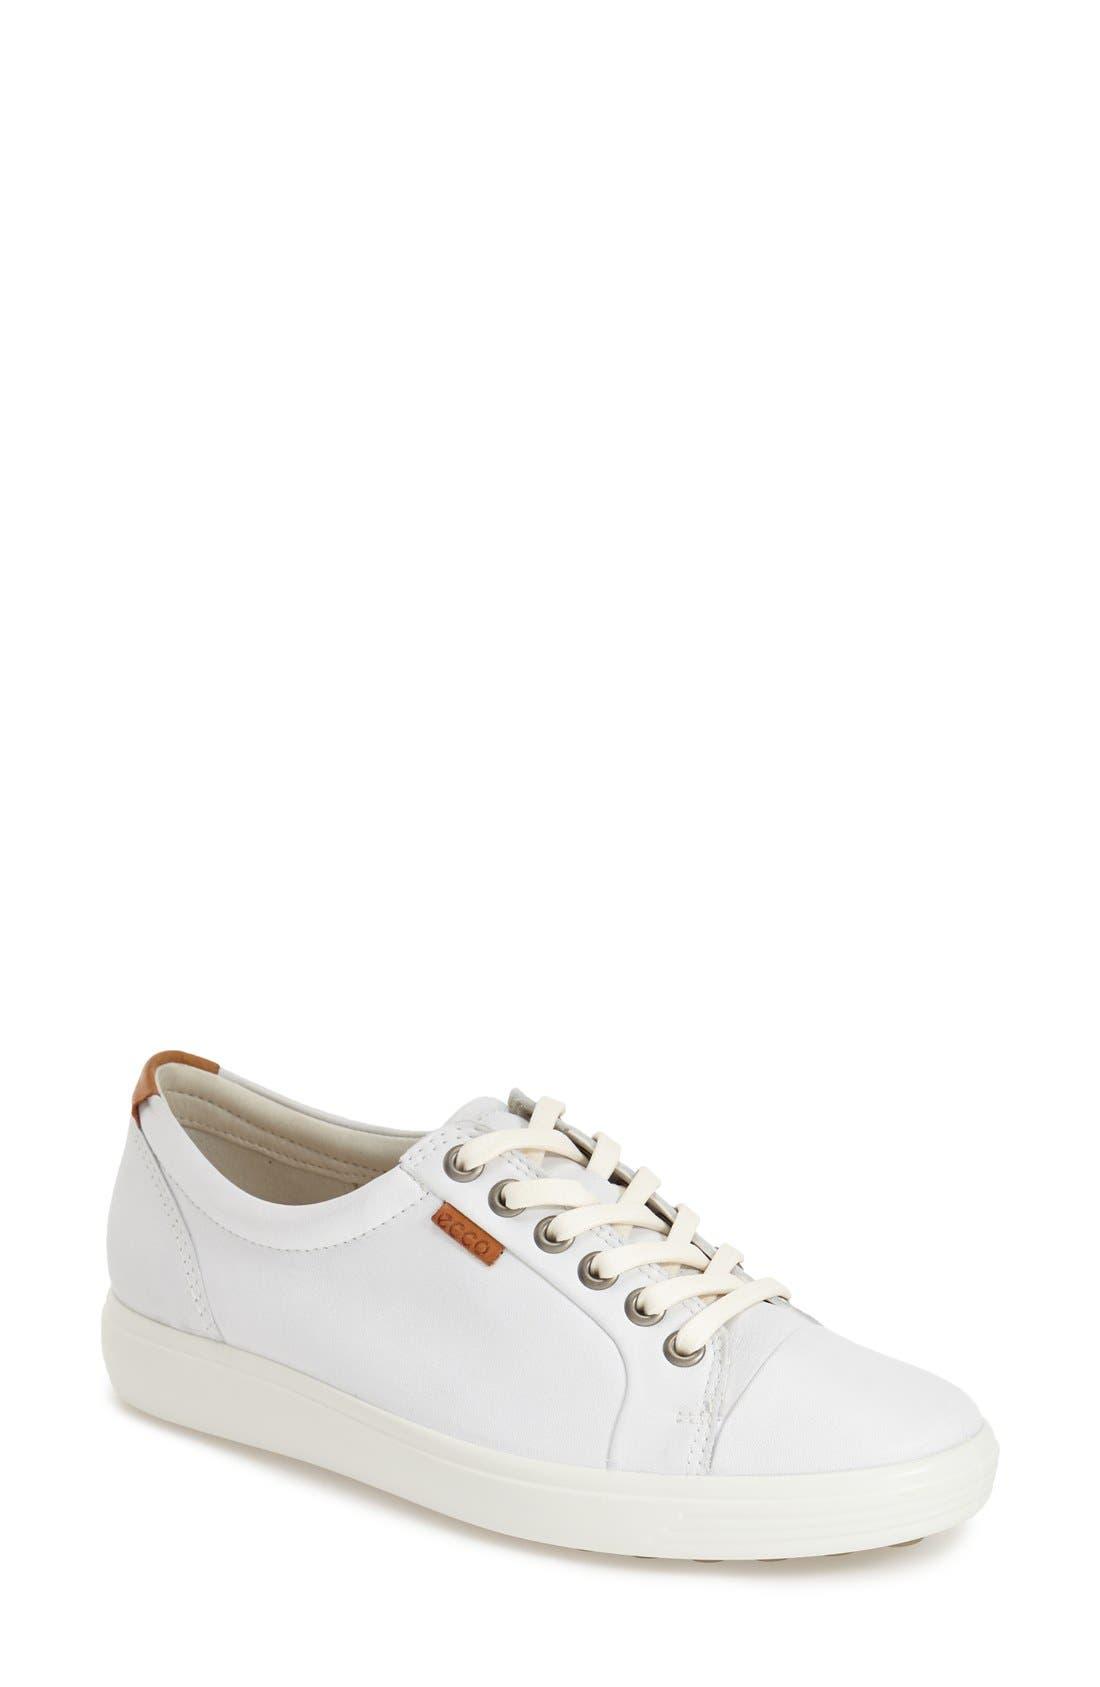 ,                             Soft 7 Sneaker,                             Main thumbnail 229, color,                             100